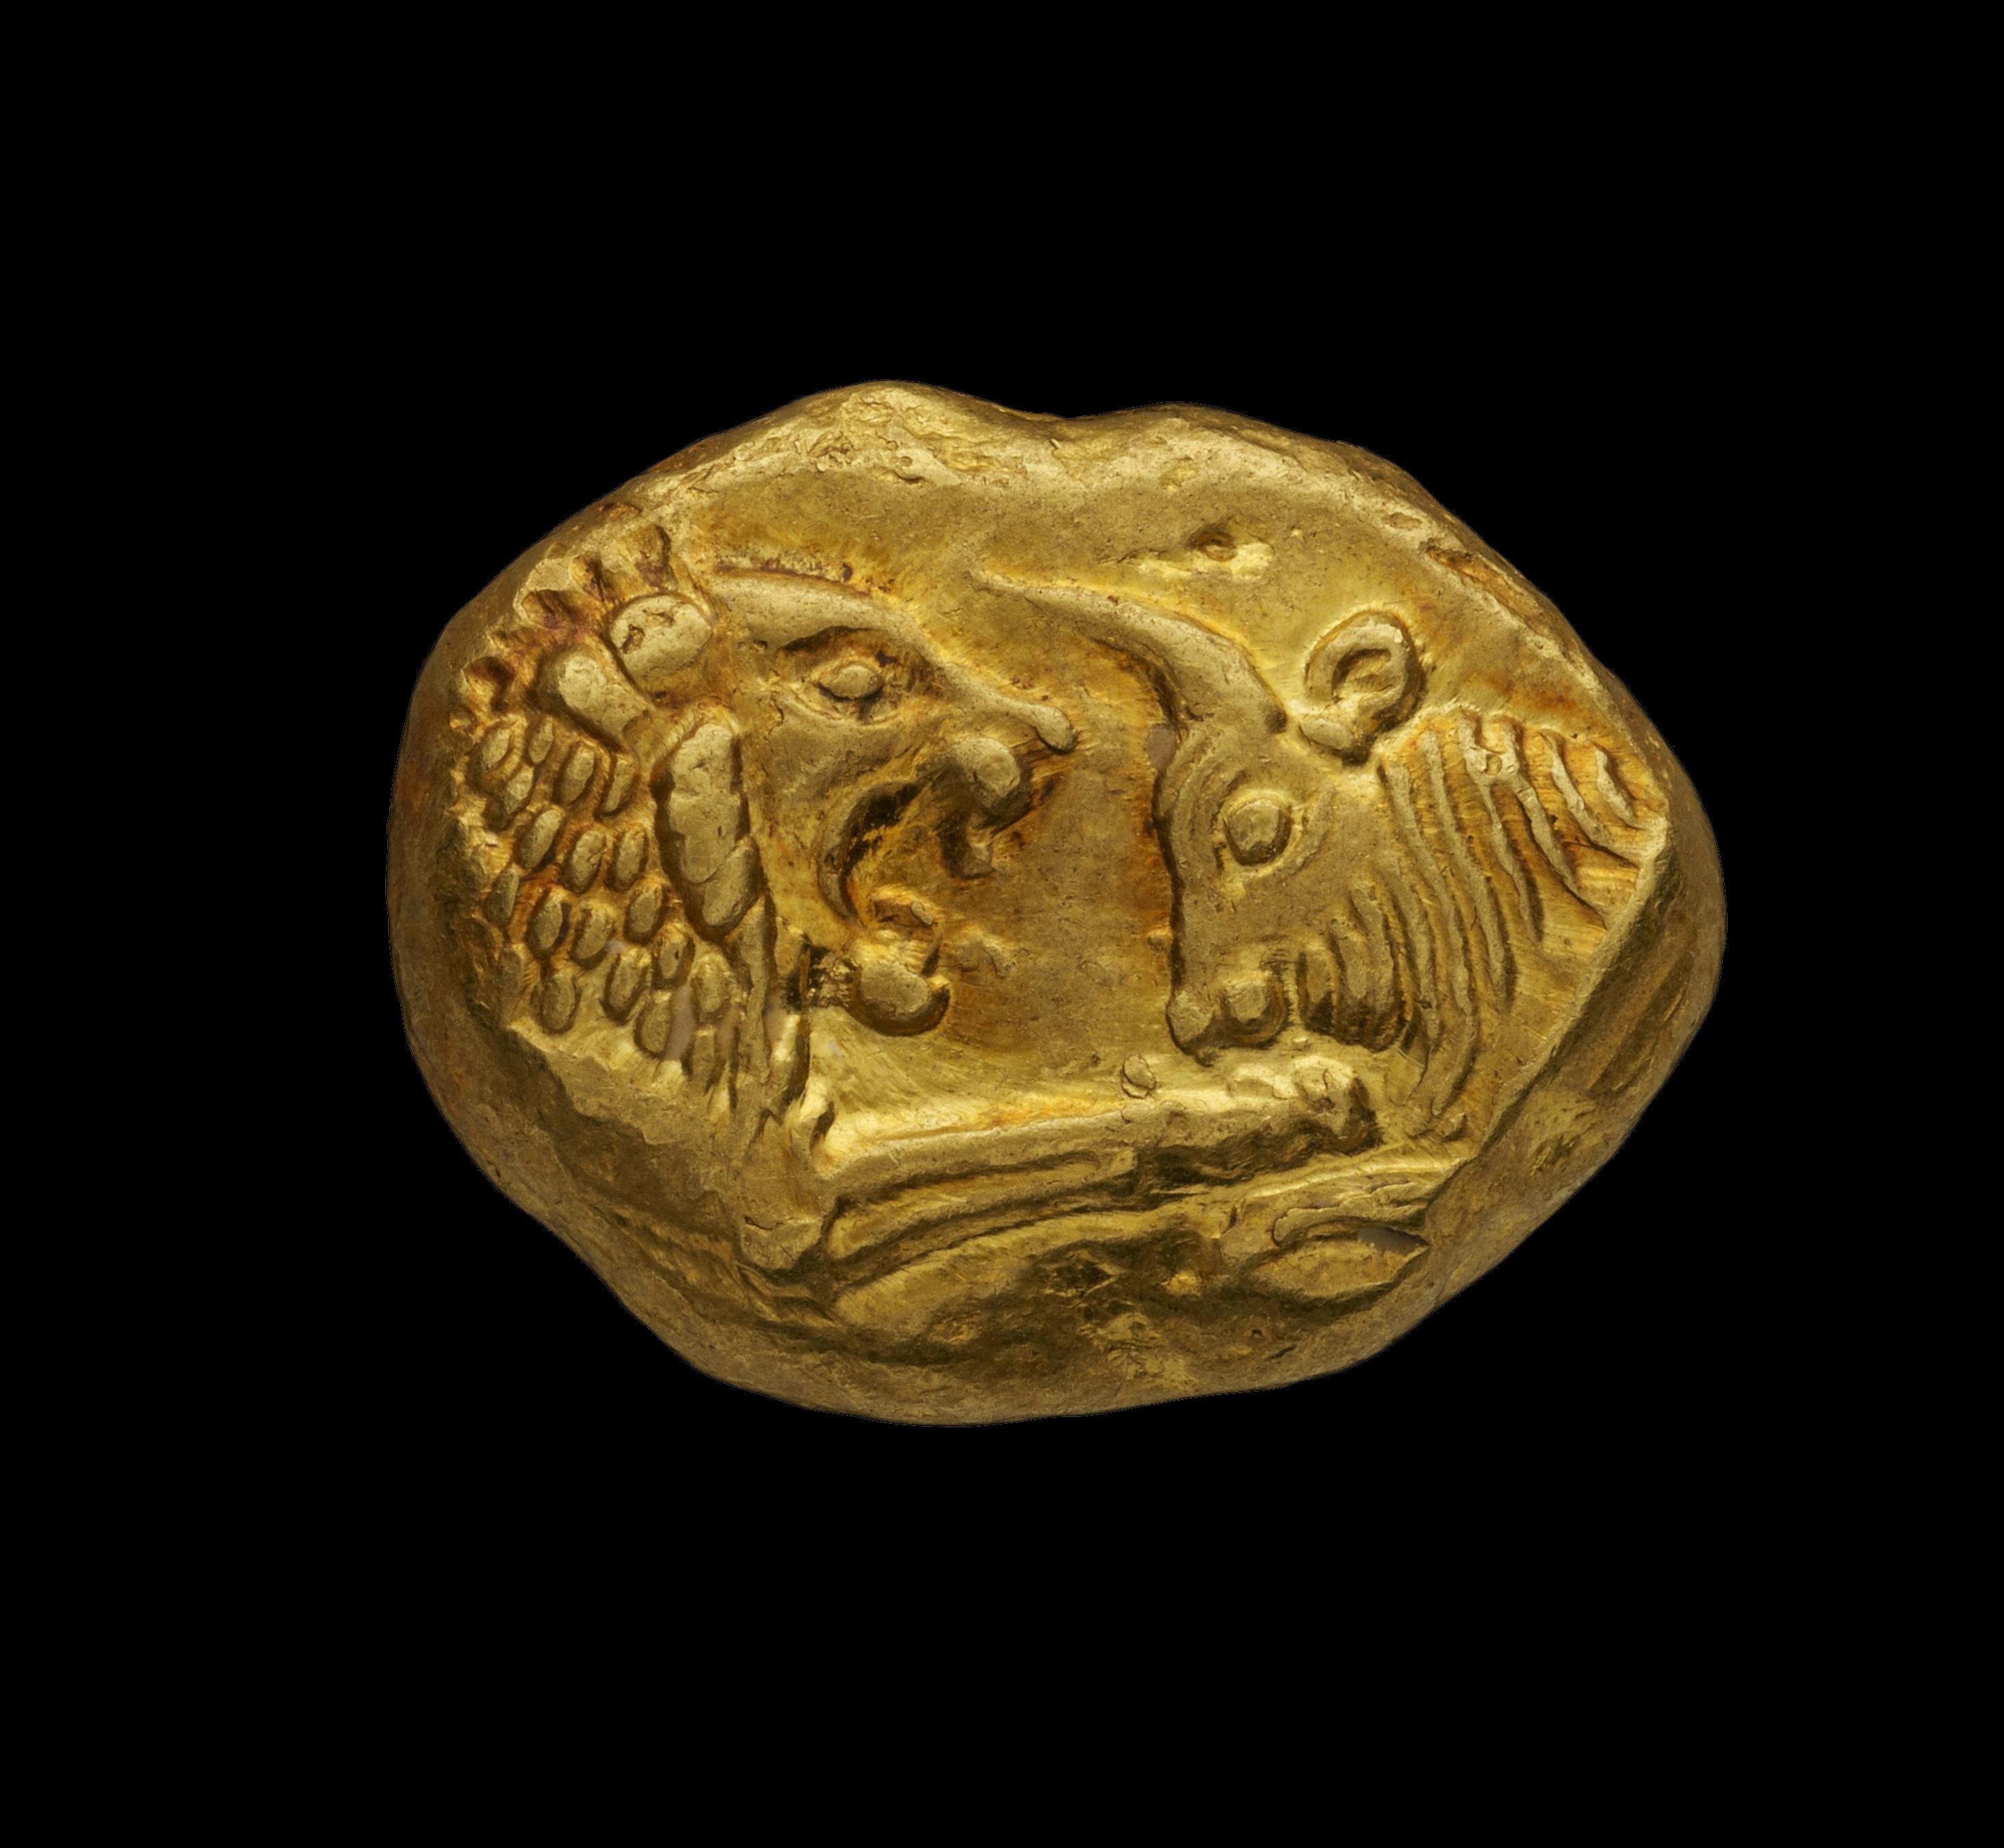 Gold Stater, Lydia, Kroisos at Kallos Gallery| ©Steve Wakeham/Kallos Gallery